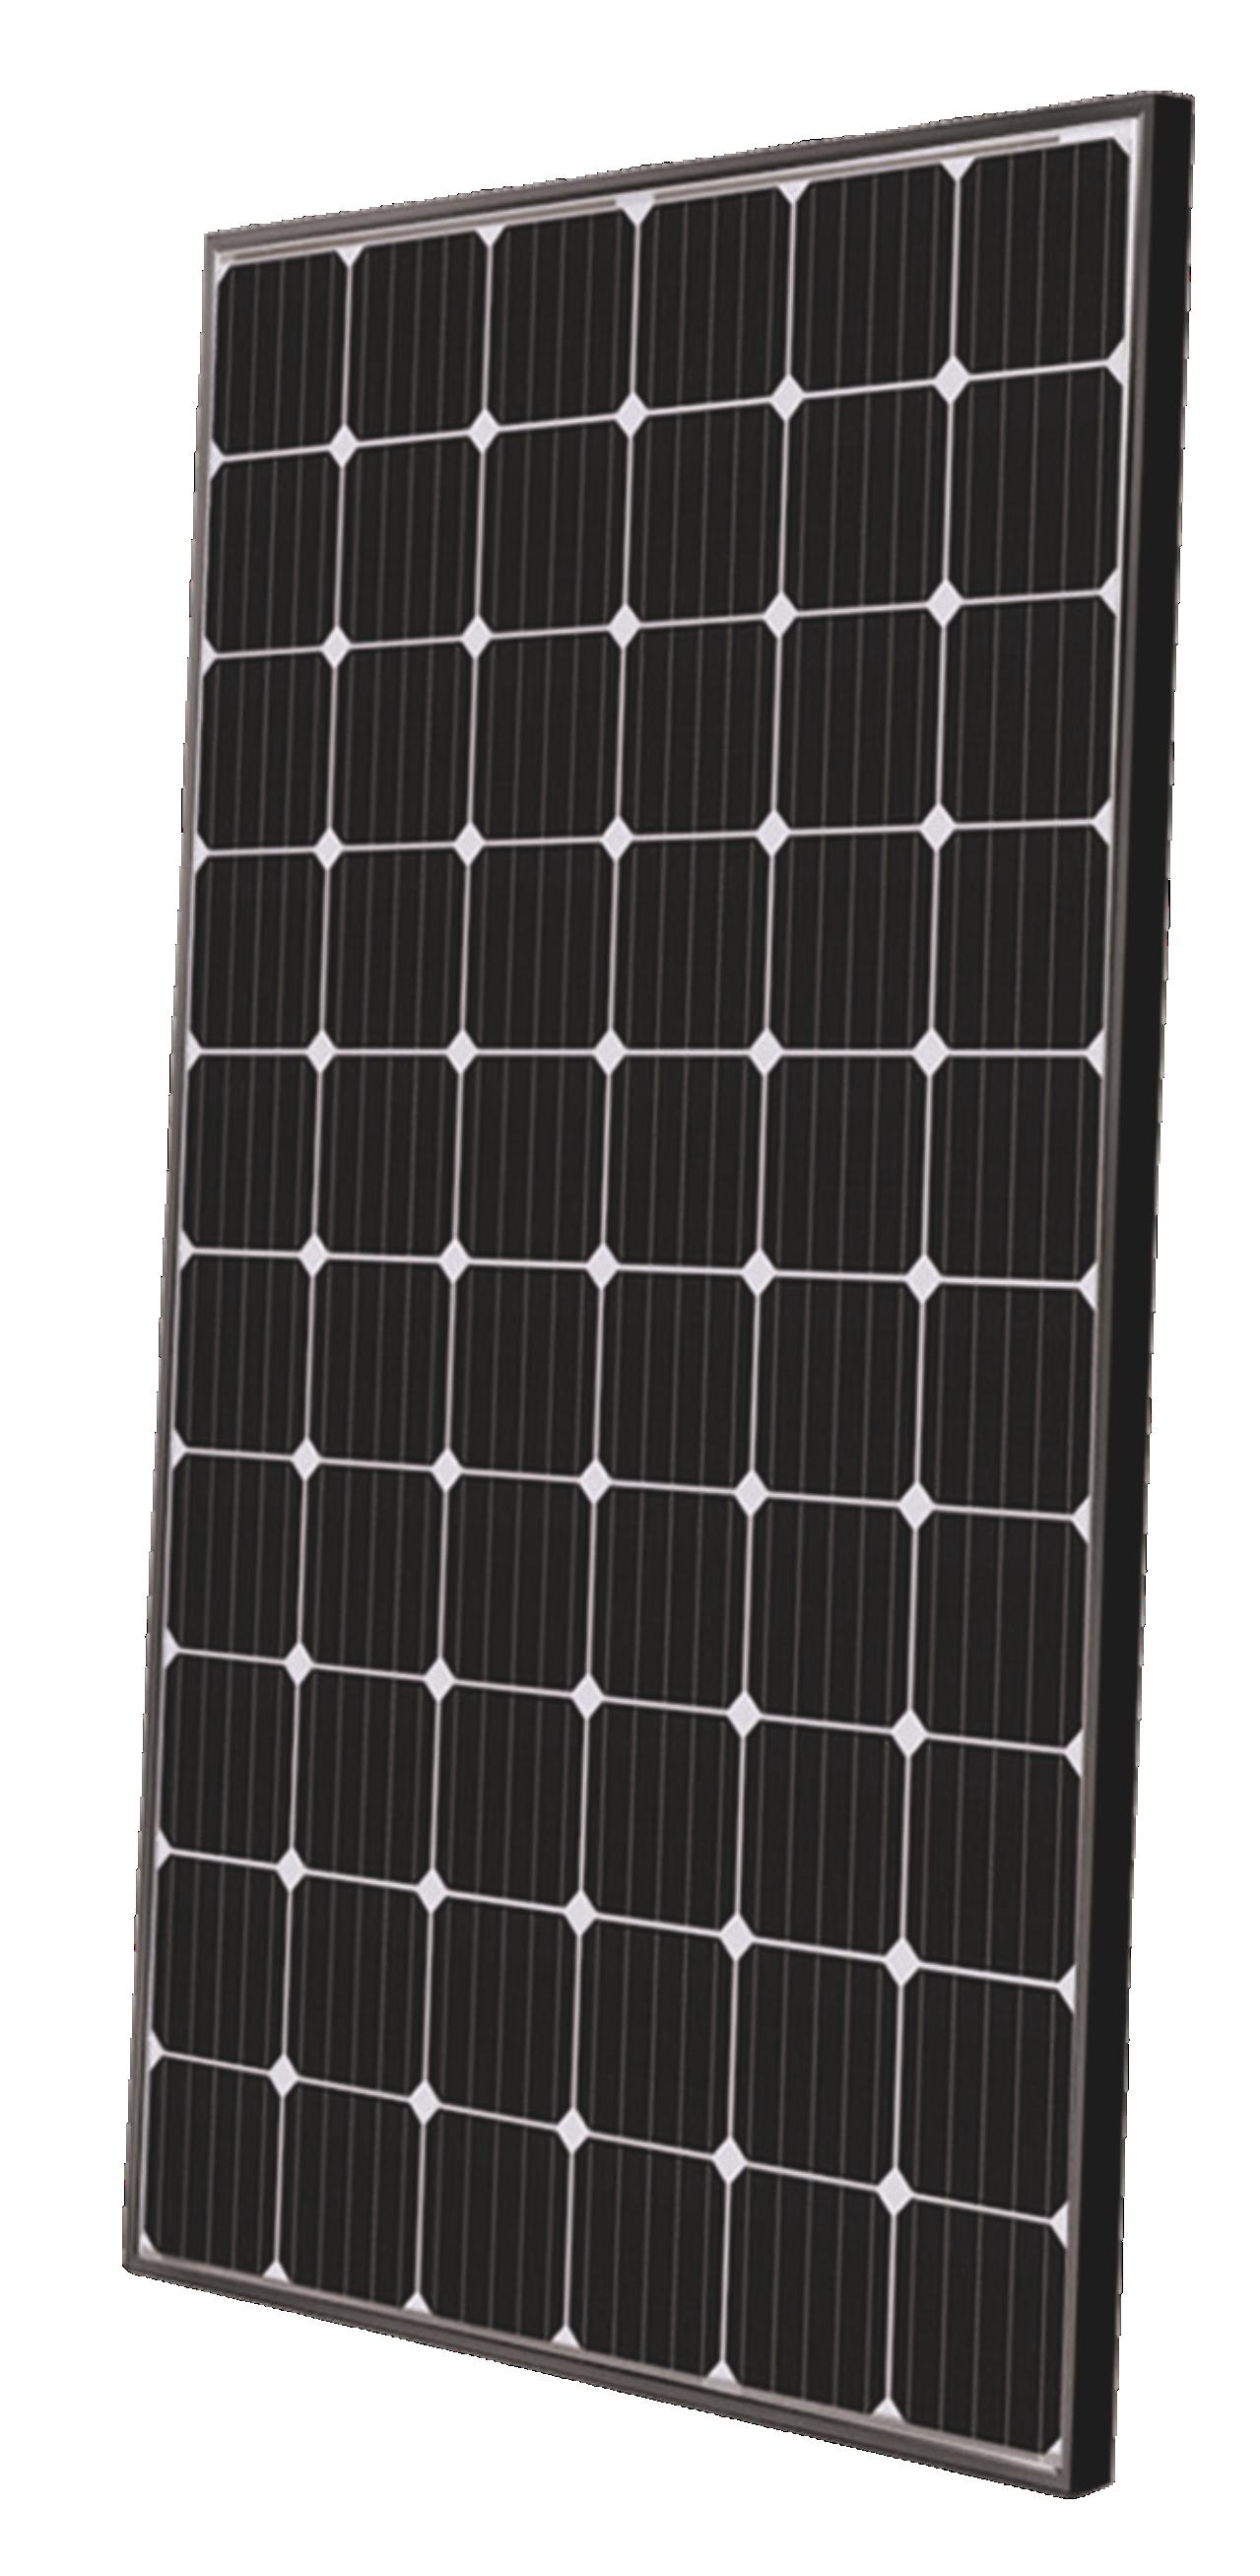 HC780MONO-SNC-30M - Mono Crystalline Solar Panel SNC-30M 290-310 Pmax